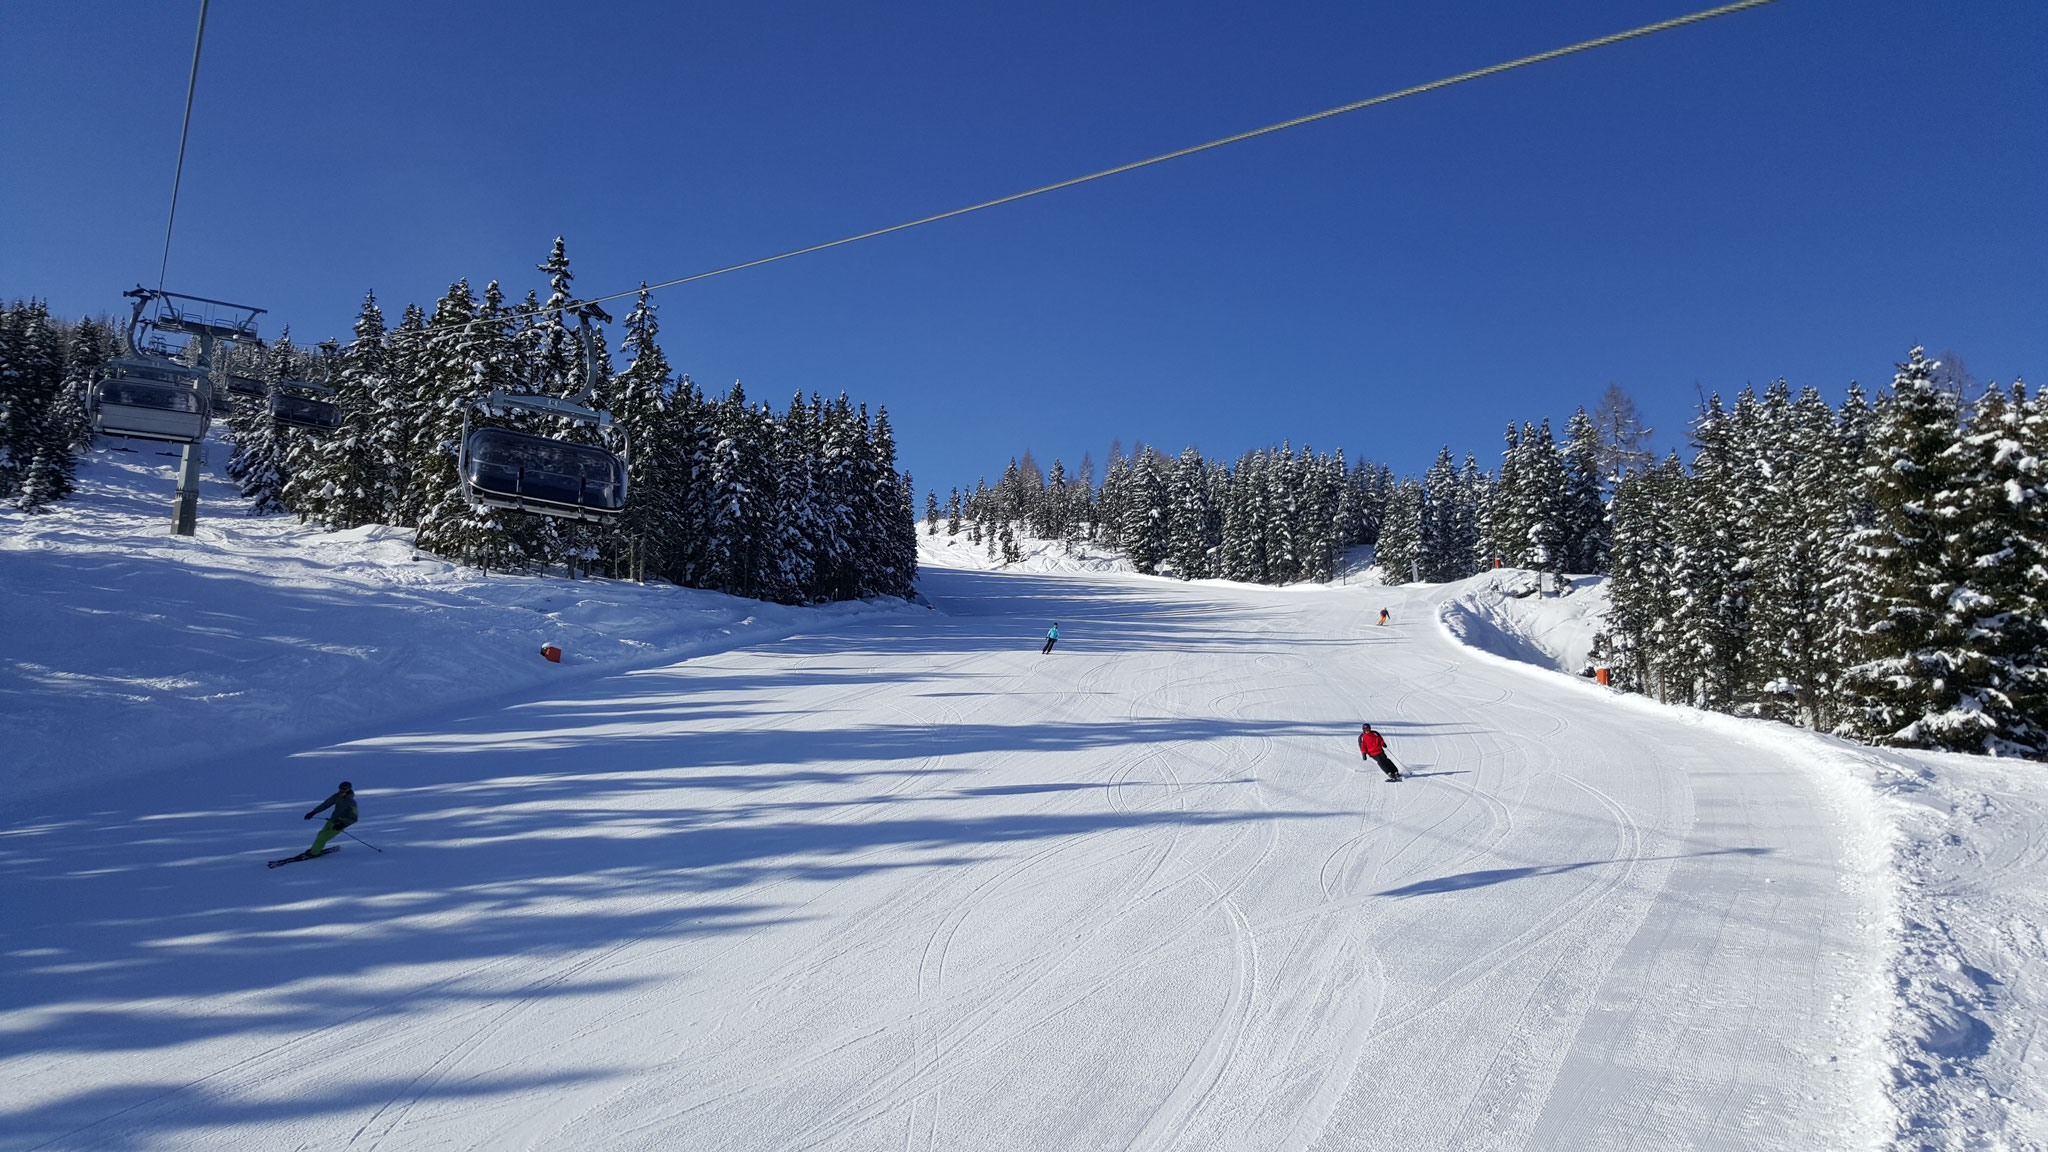 The best slopes